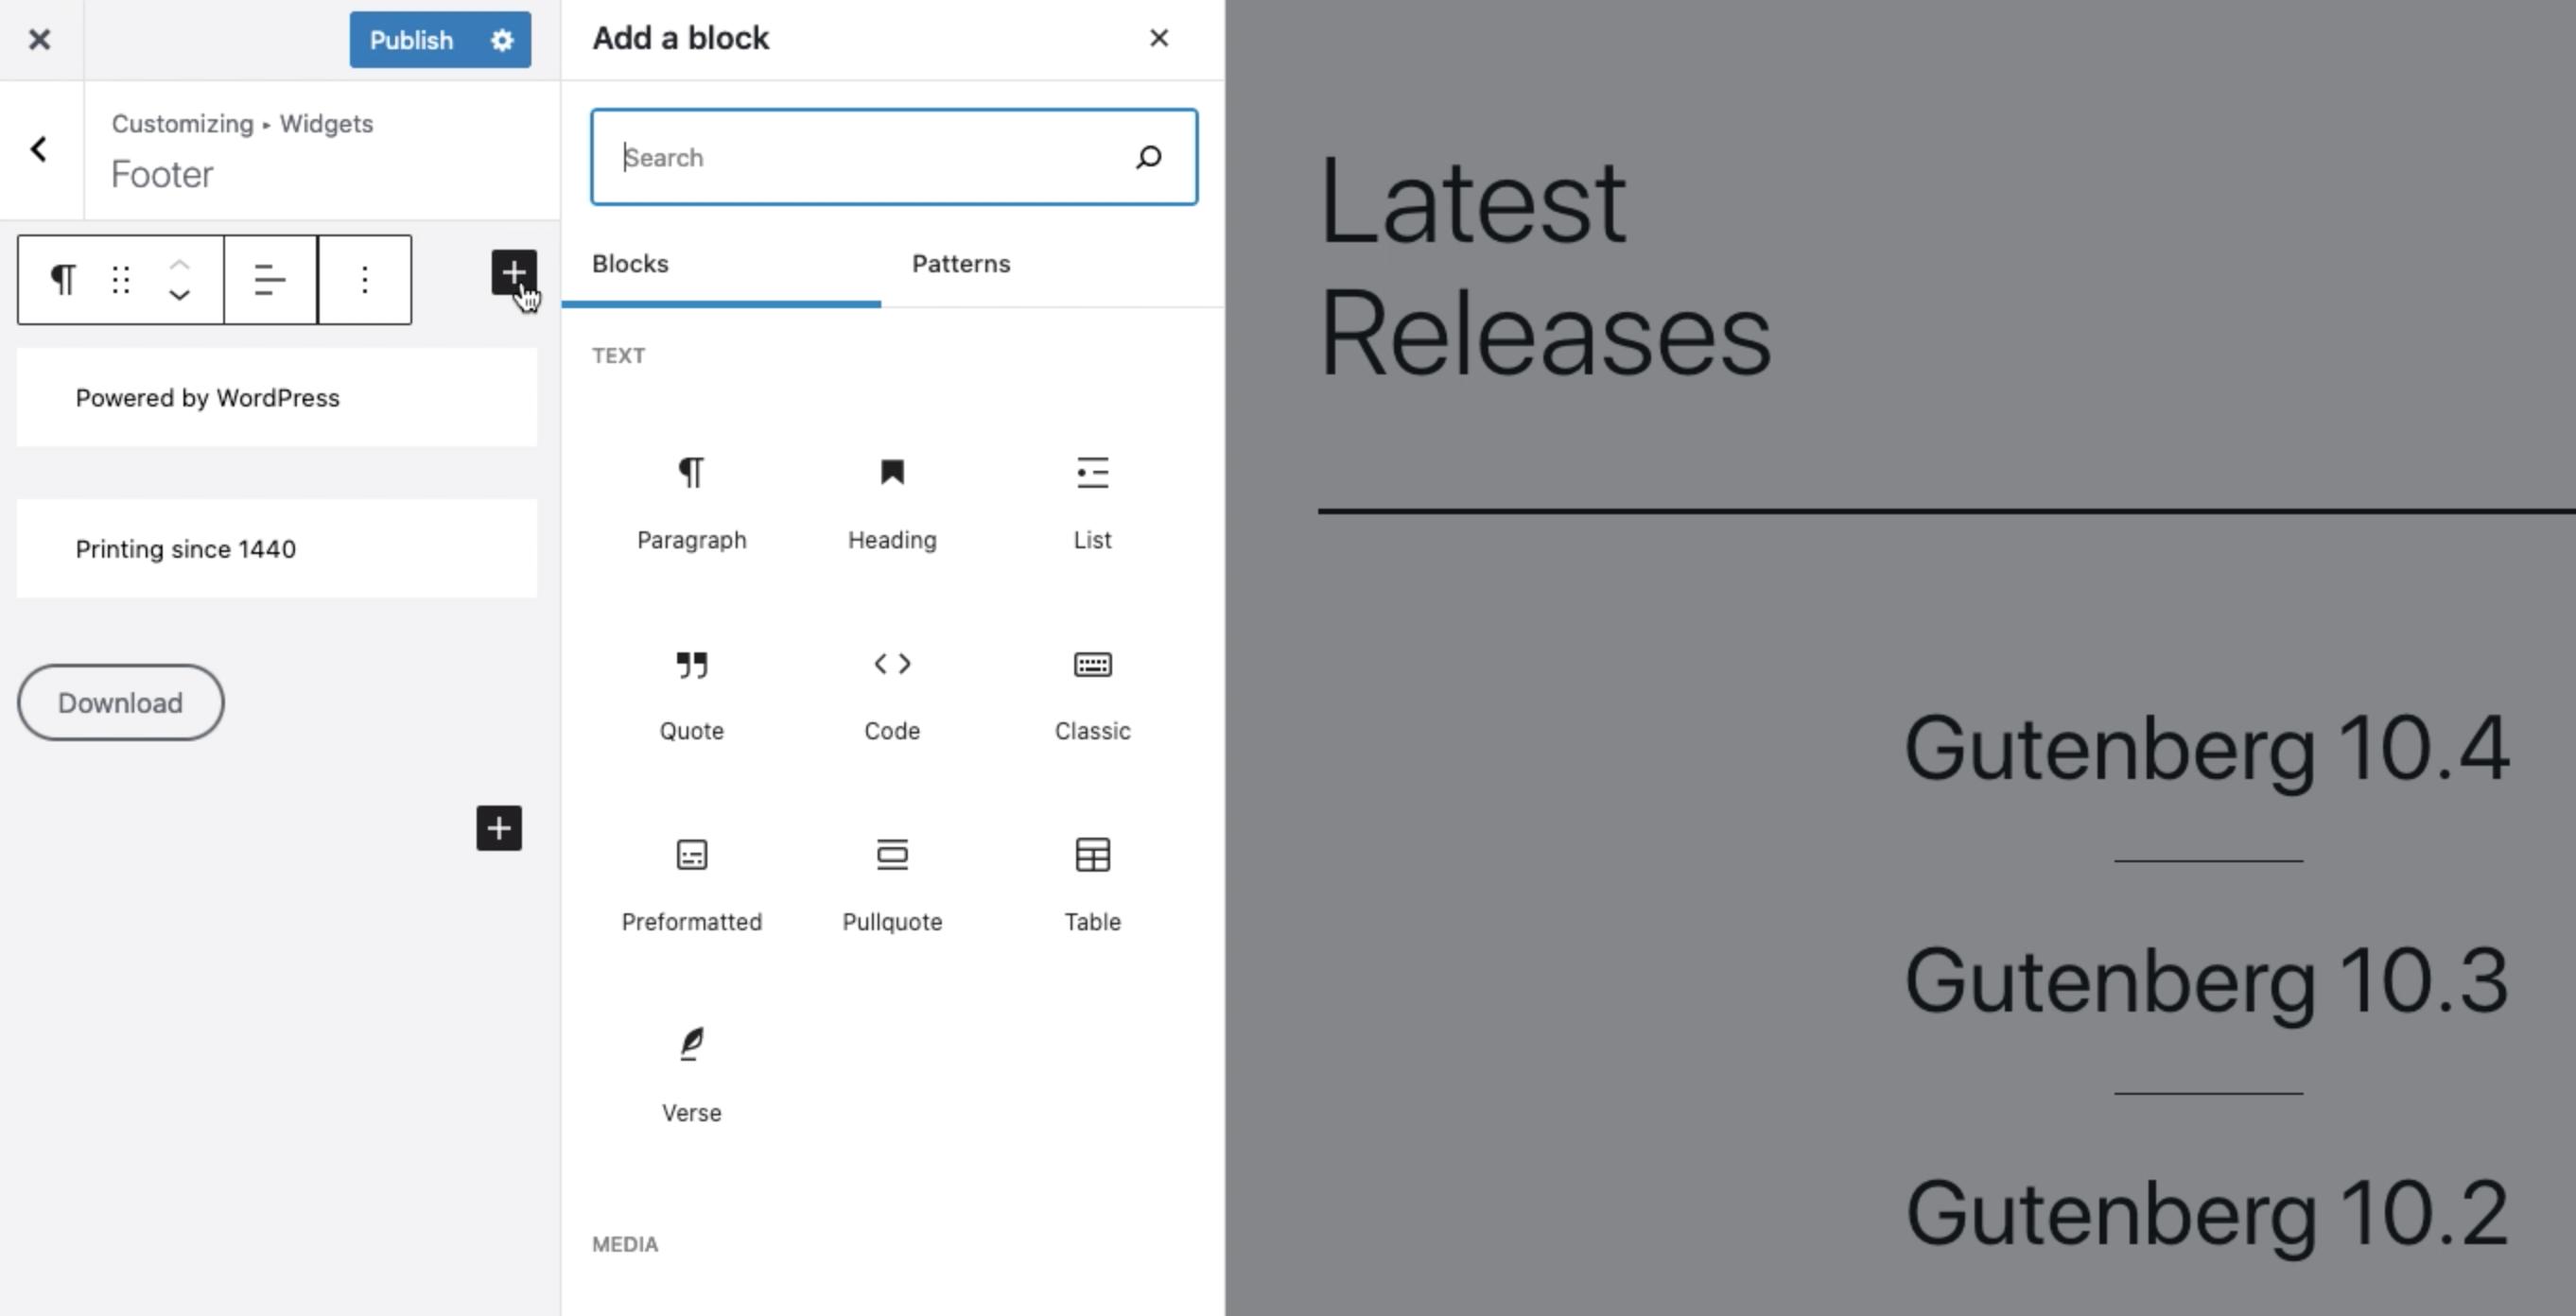 Gutenberg 10.4 Introduces Block Widgets in the Customizer